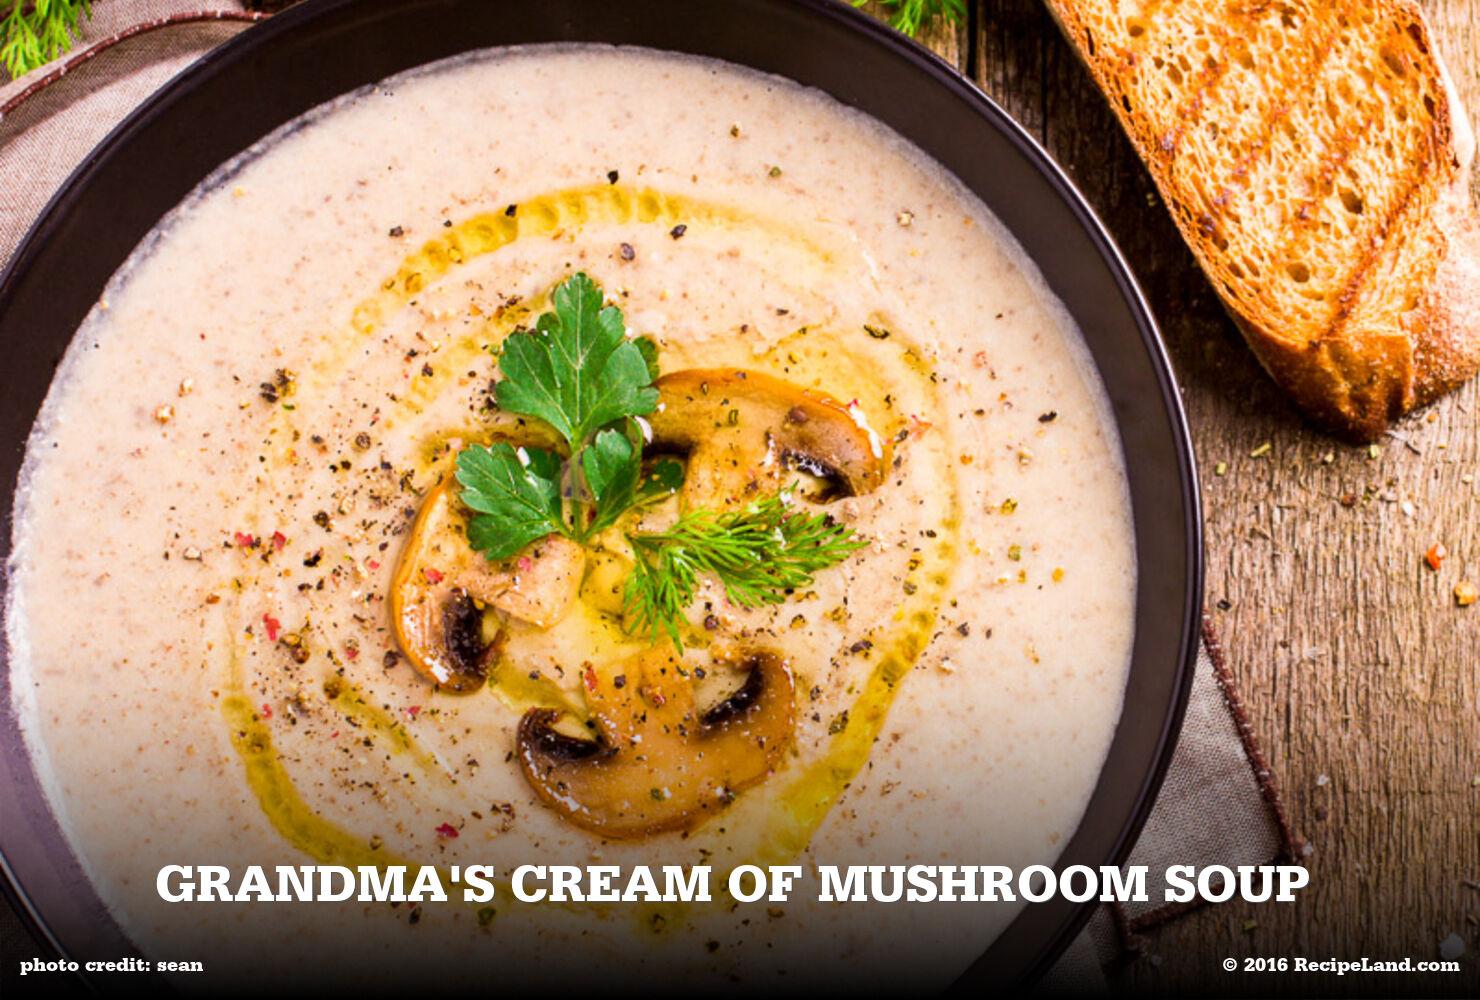 Grandma's Cream of Mushroom Soup